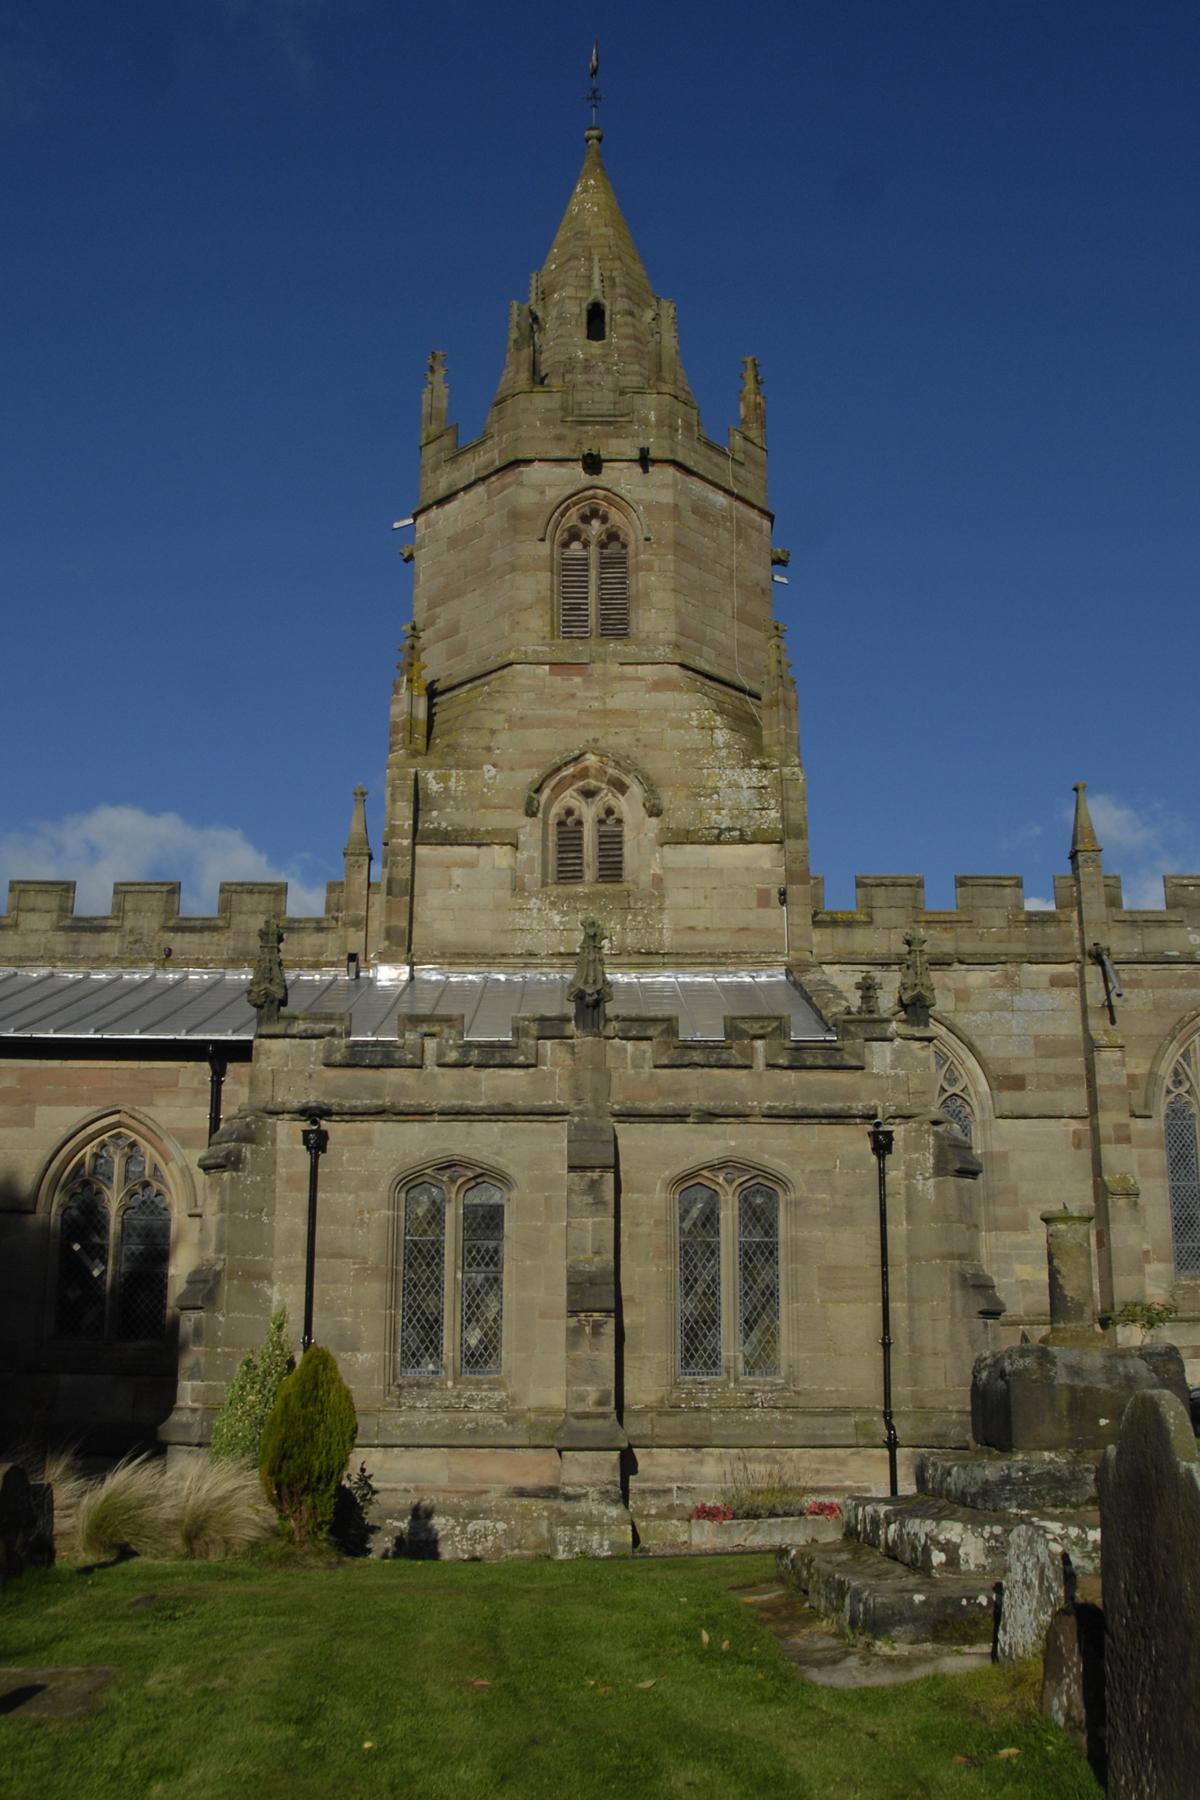 File:Crossing tower of St Bartholomew's Church, Tong, Shropshire